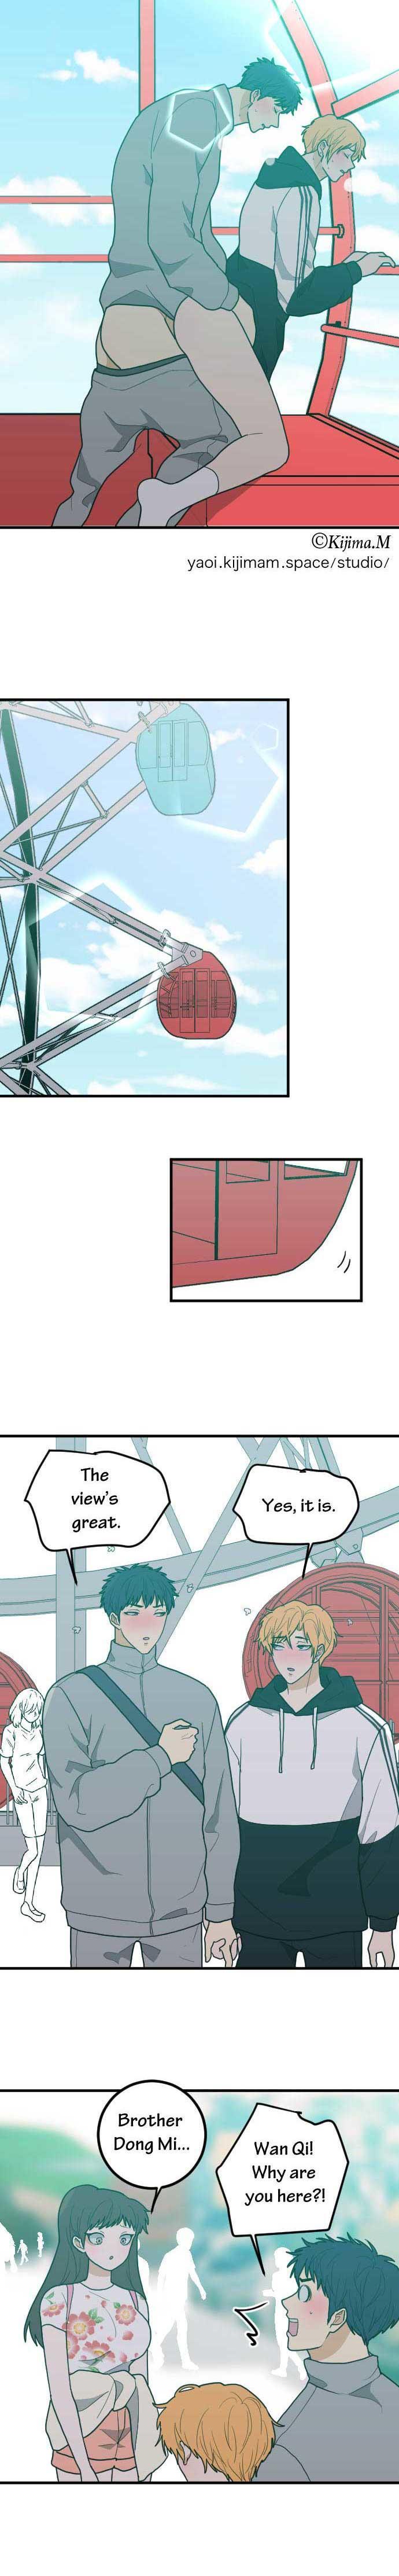 Roomxmate Chapter 51 page 12 - Mangakakalots.com